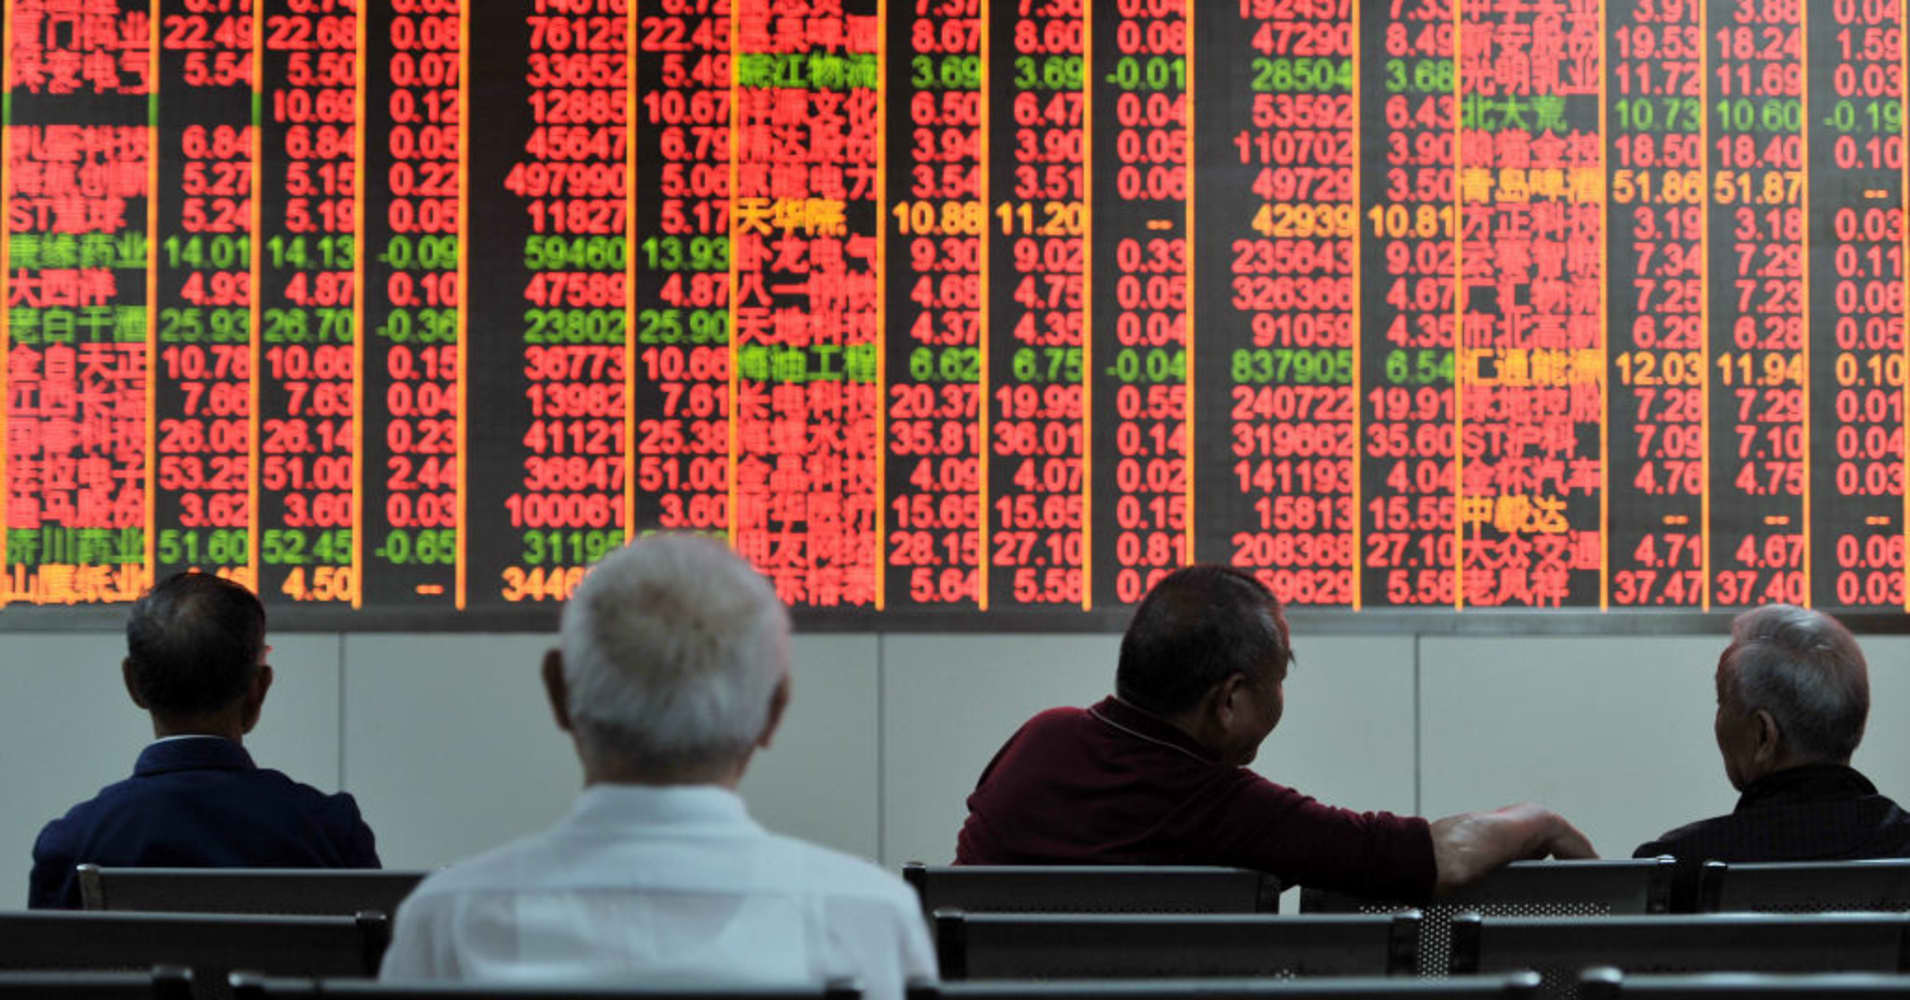 Investors should 'absolutely' own mainland China assets: Bank Julius Baer